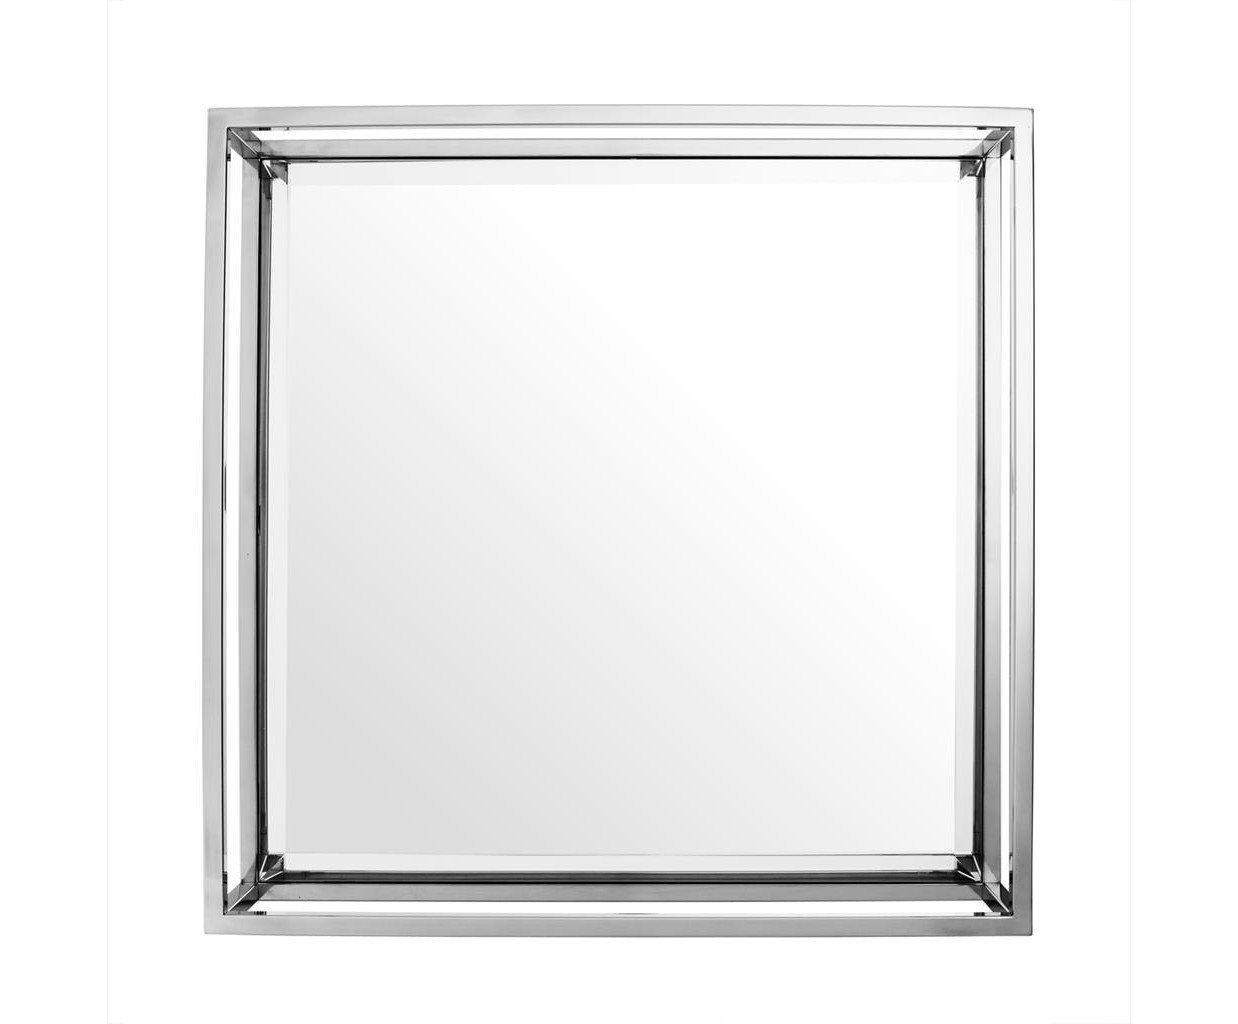 ЗеркалоНастенные зеркала<br>Зеркало Mirror Cromwell в рама из полированной нержавеющей стали.<br><br>Material: Сталь<br>Width см: 60<br>Depth см: 15<br>Height см: 60